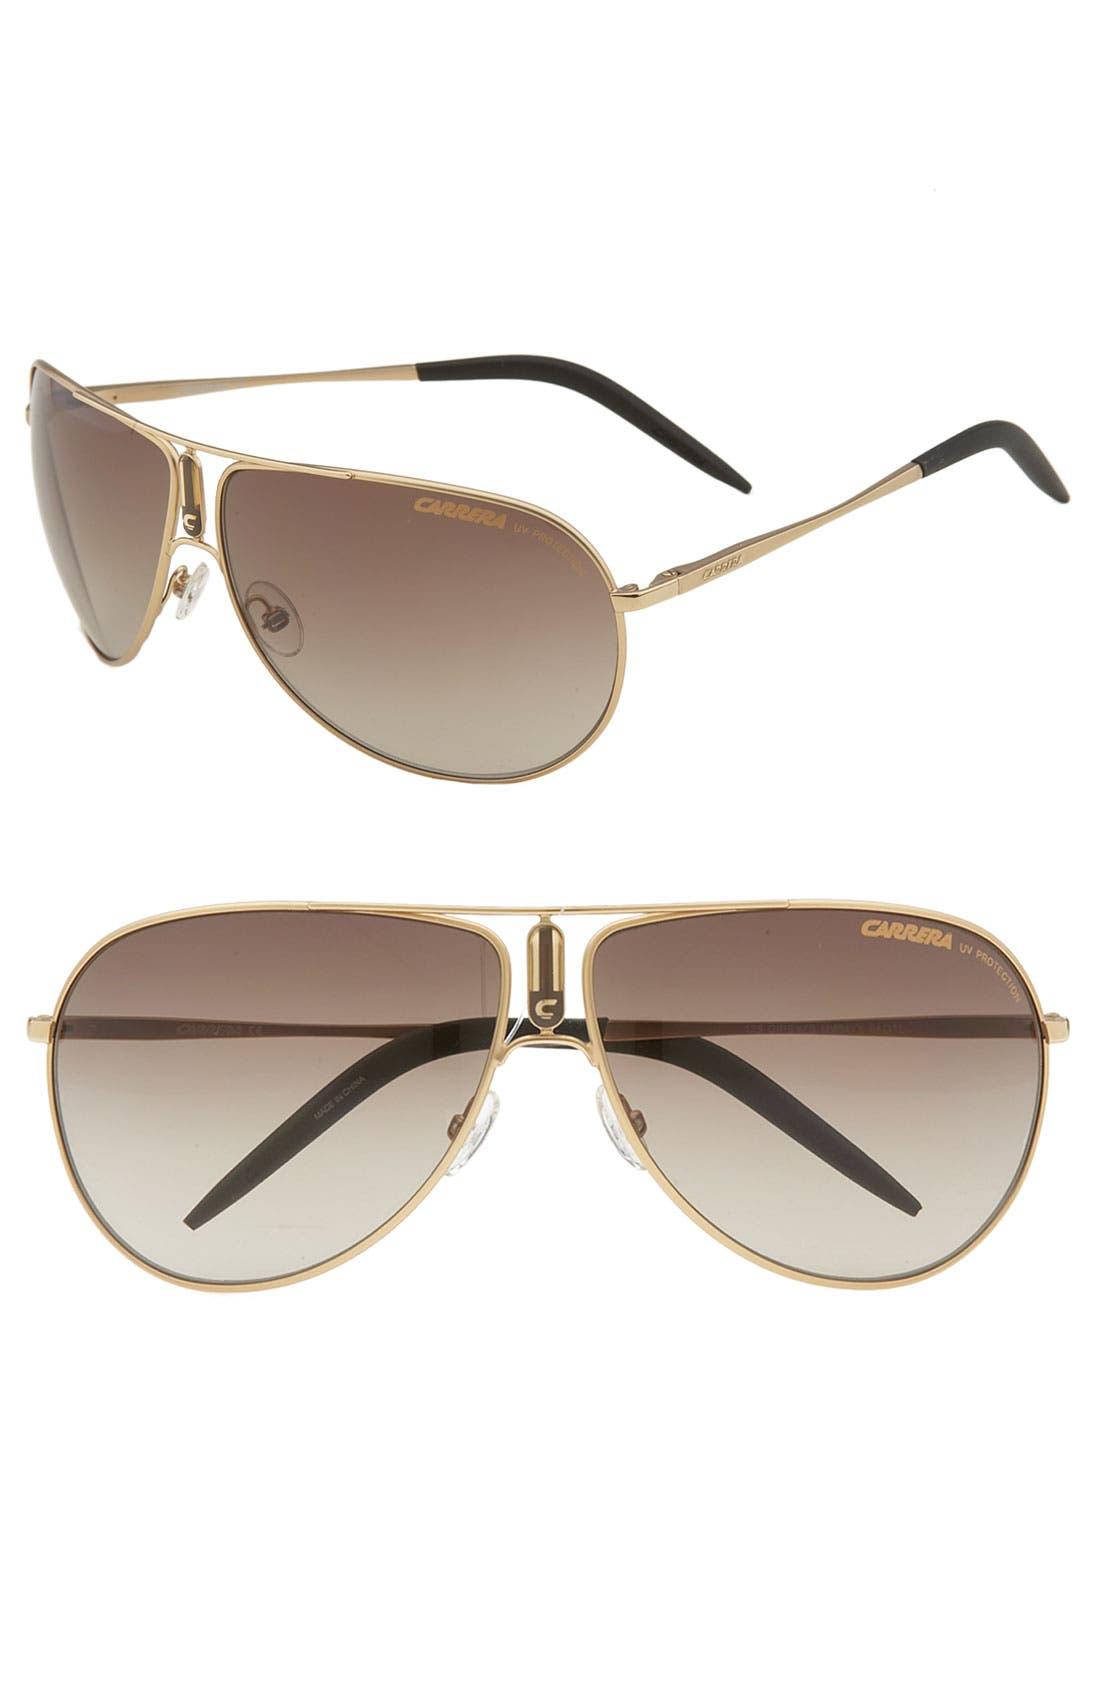 Alternate Image 1 Selected - Carrera Eyewear 'Gypsy' Metal Aviator Sunglasses